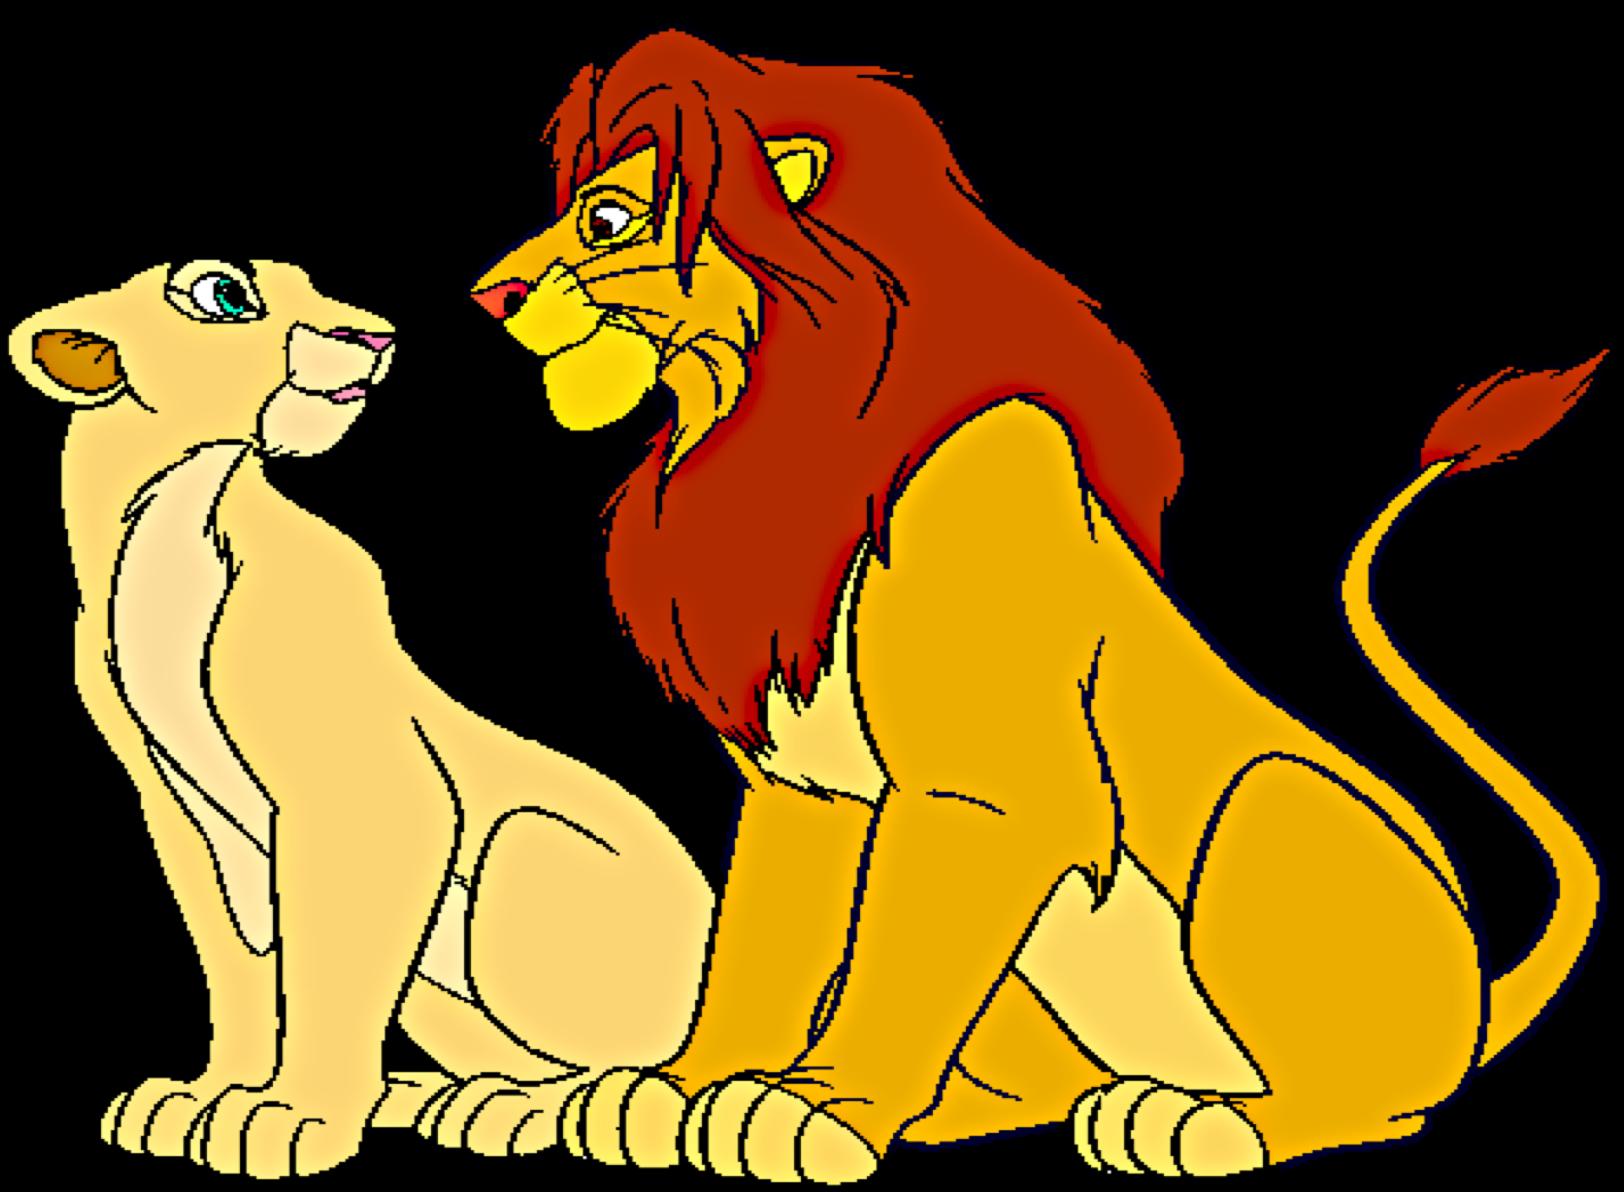 Kopa Images Simba And Nala Hd Wallpaper And Background